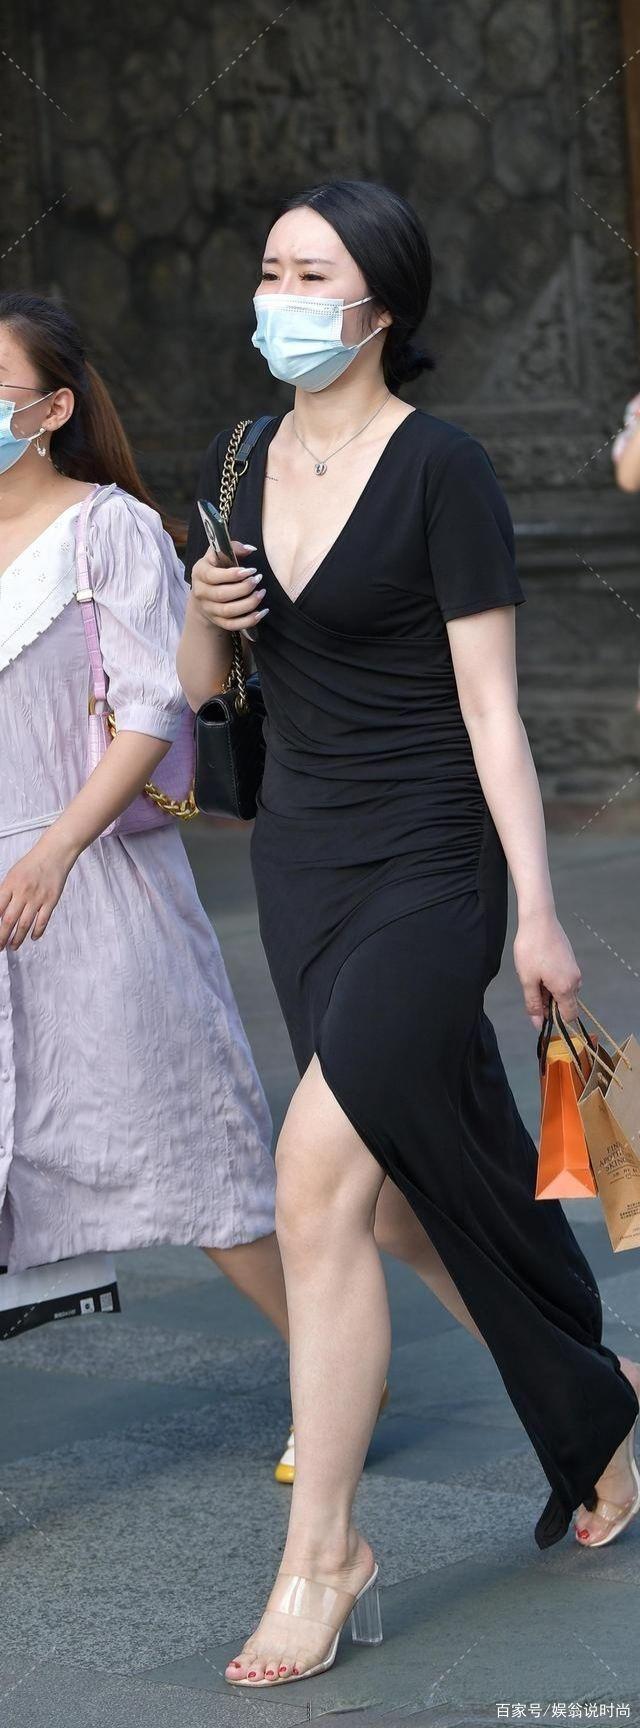 V领半袖的黑色长裙,既防晒又修身显瘦,秀出大长腿